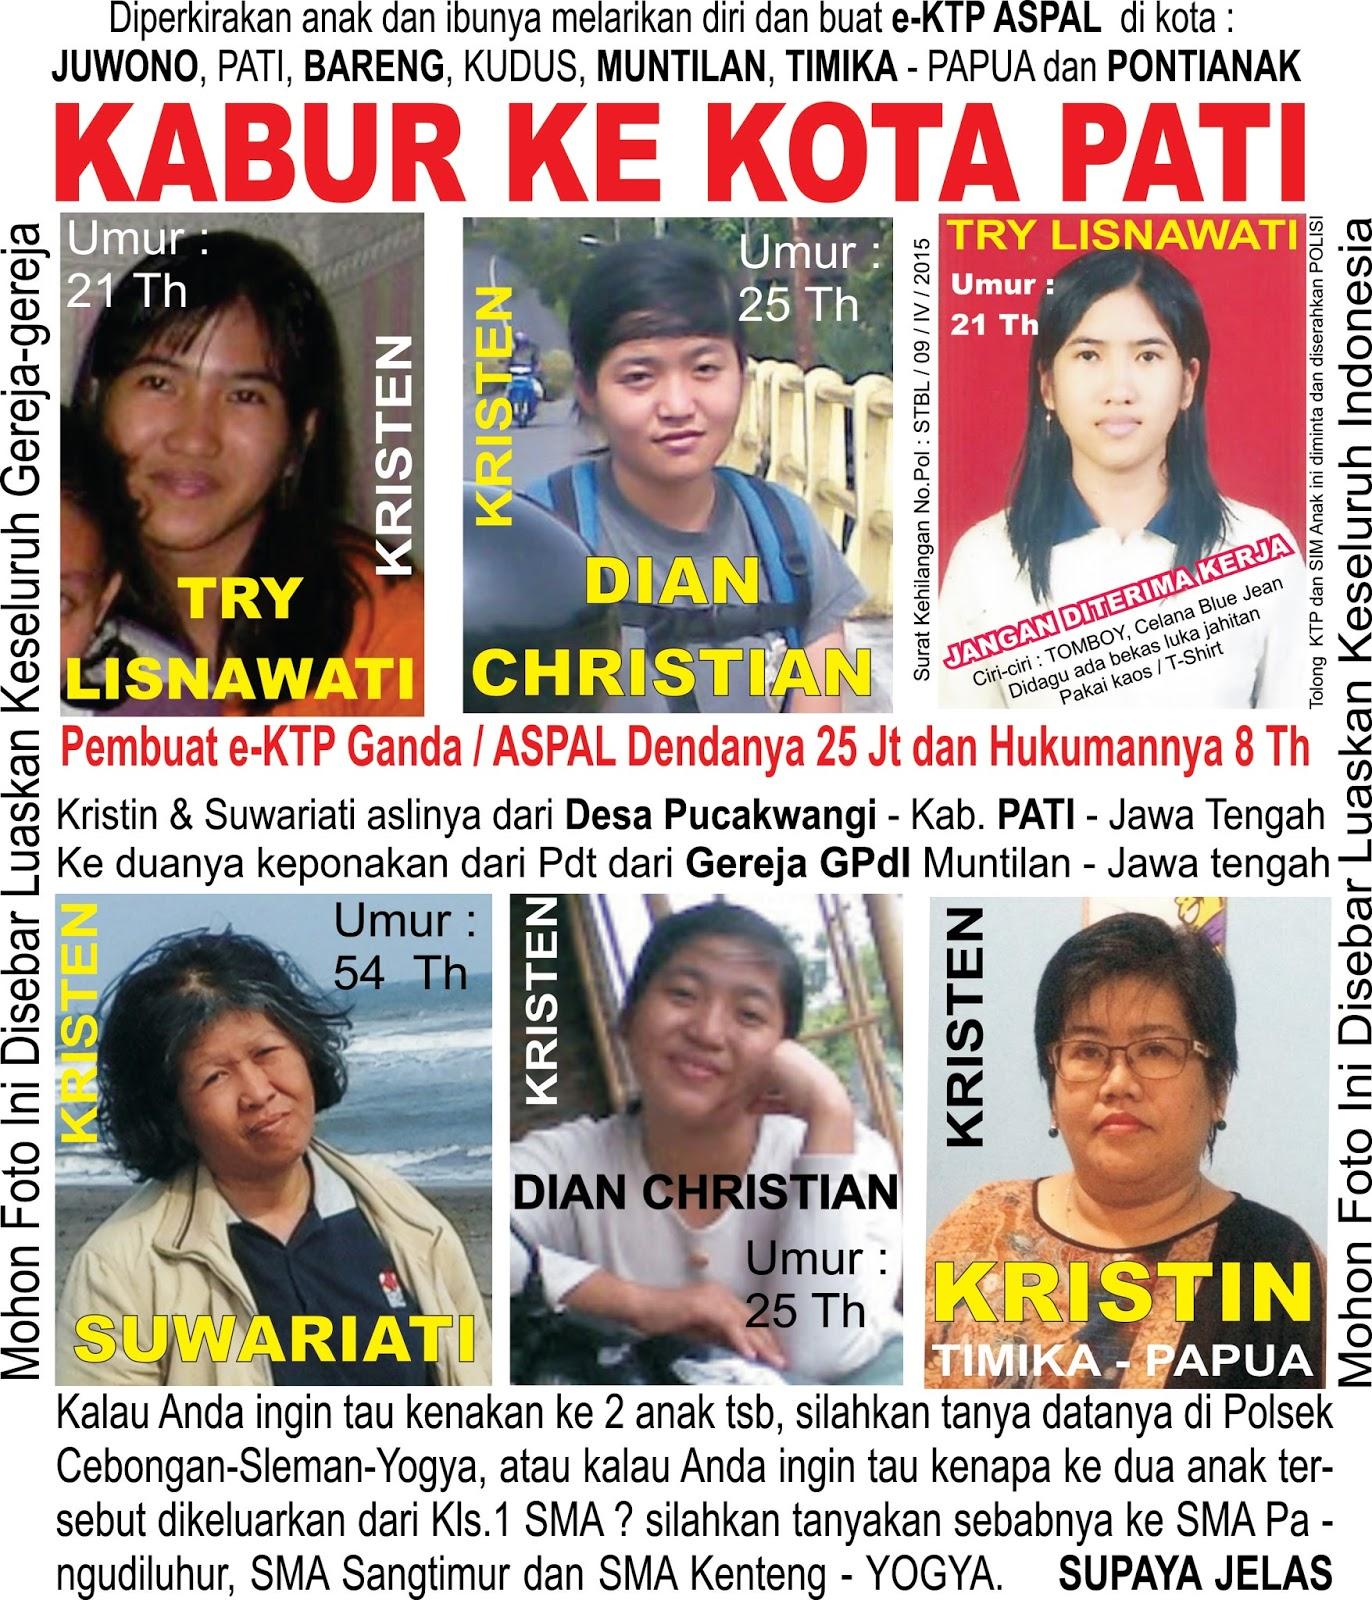 Suara Rakyat Jelata: Oktober 2010 - geliat-kawula-alit ...